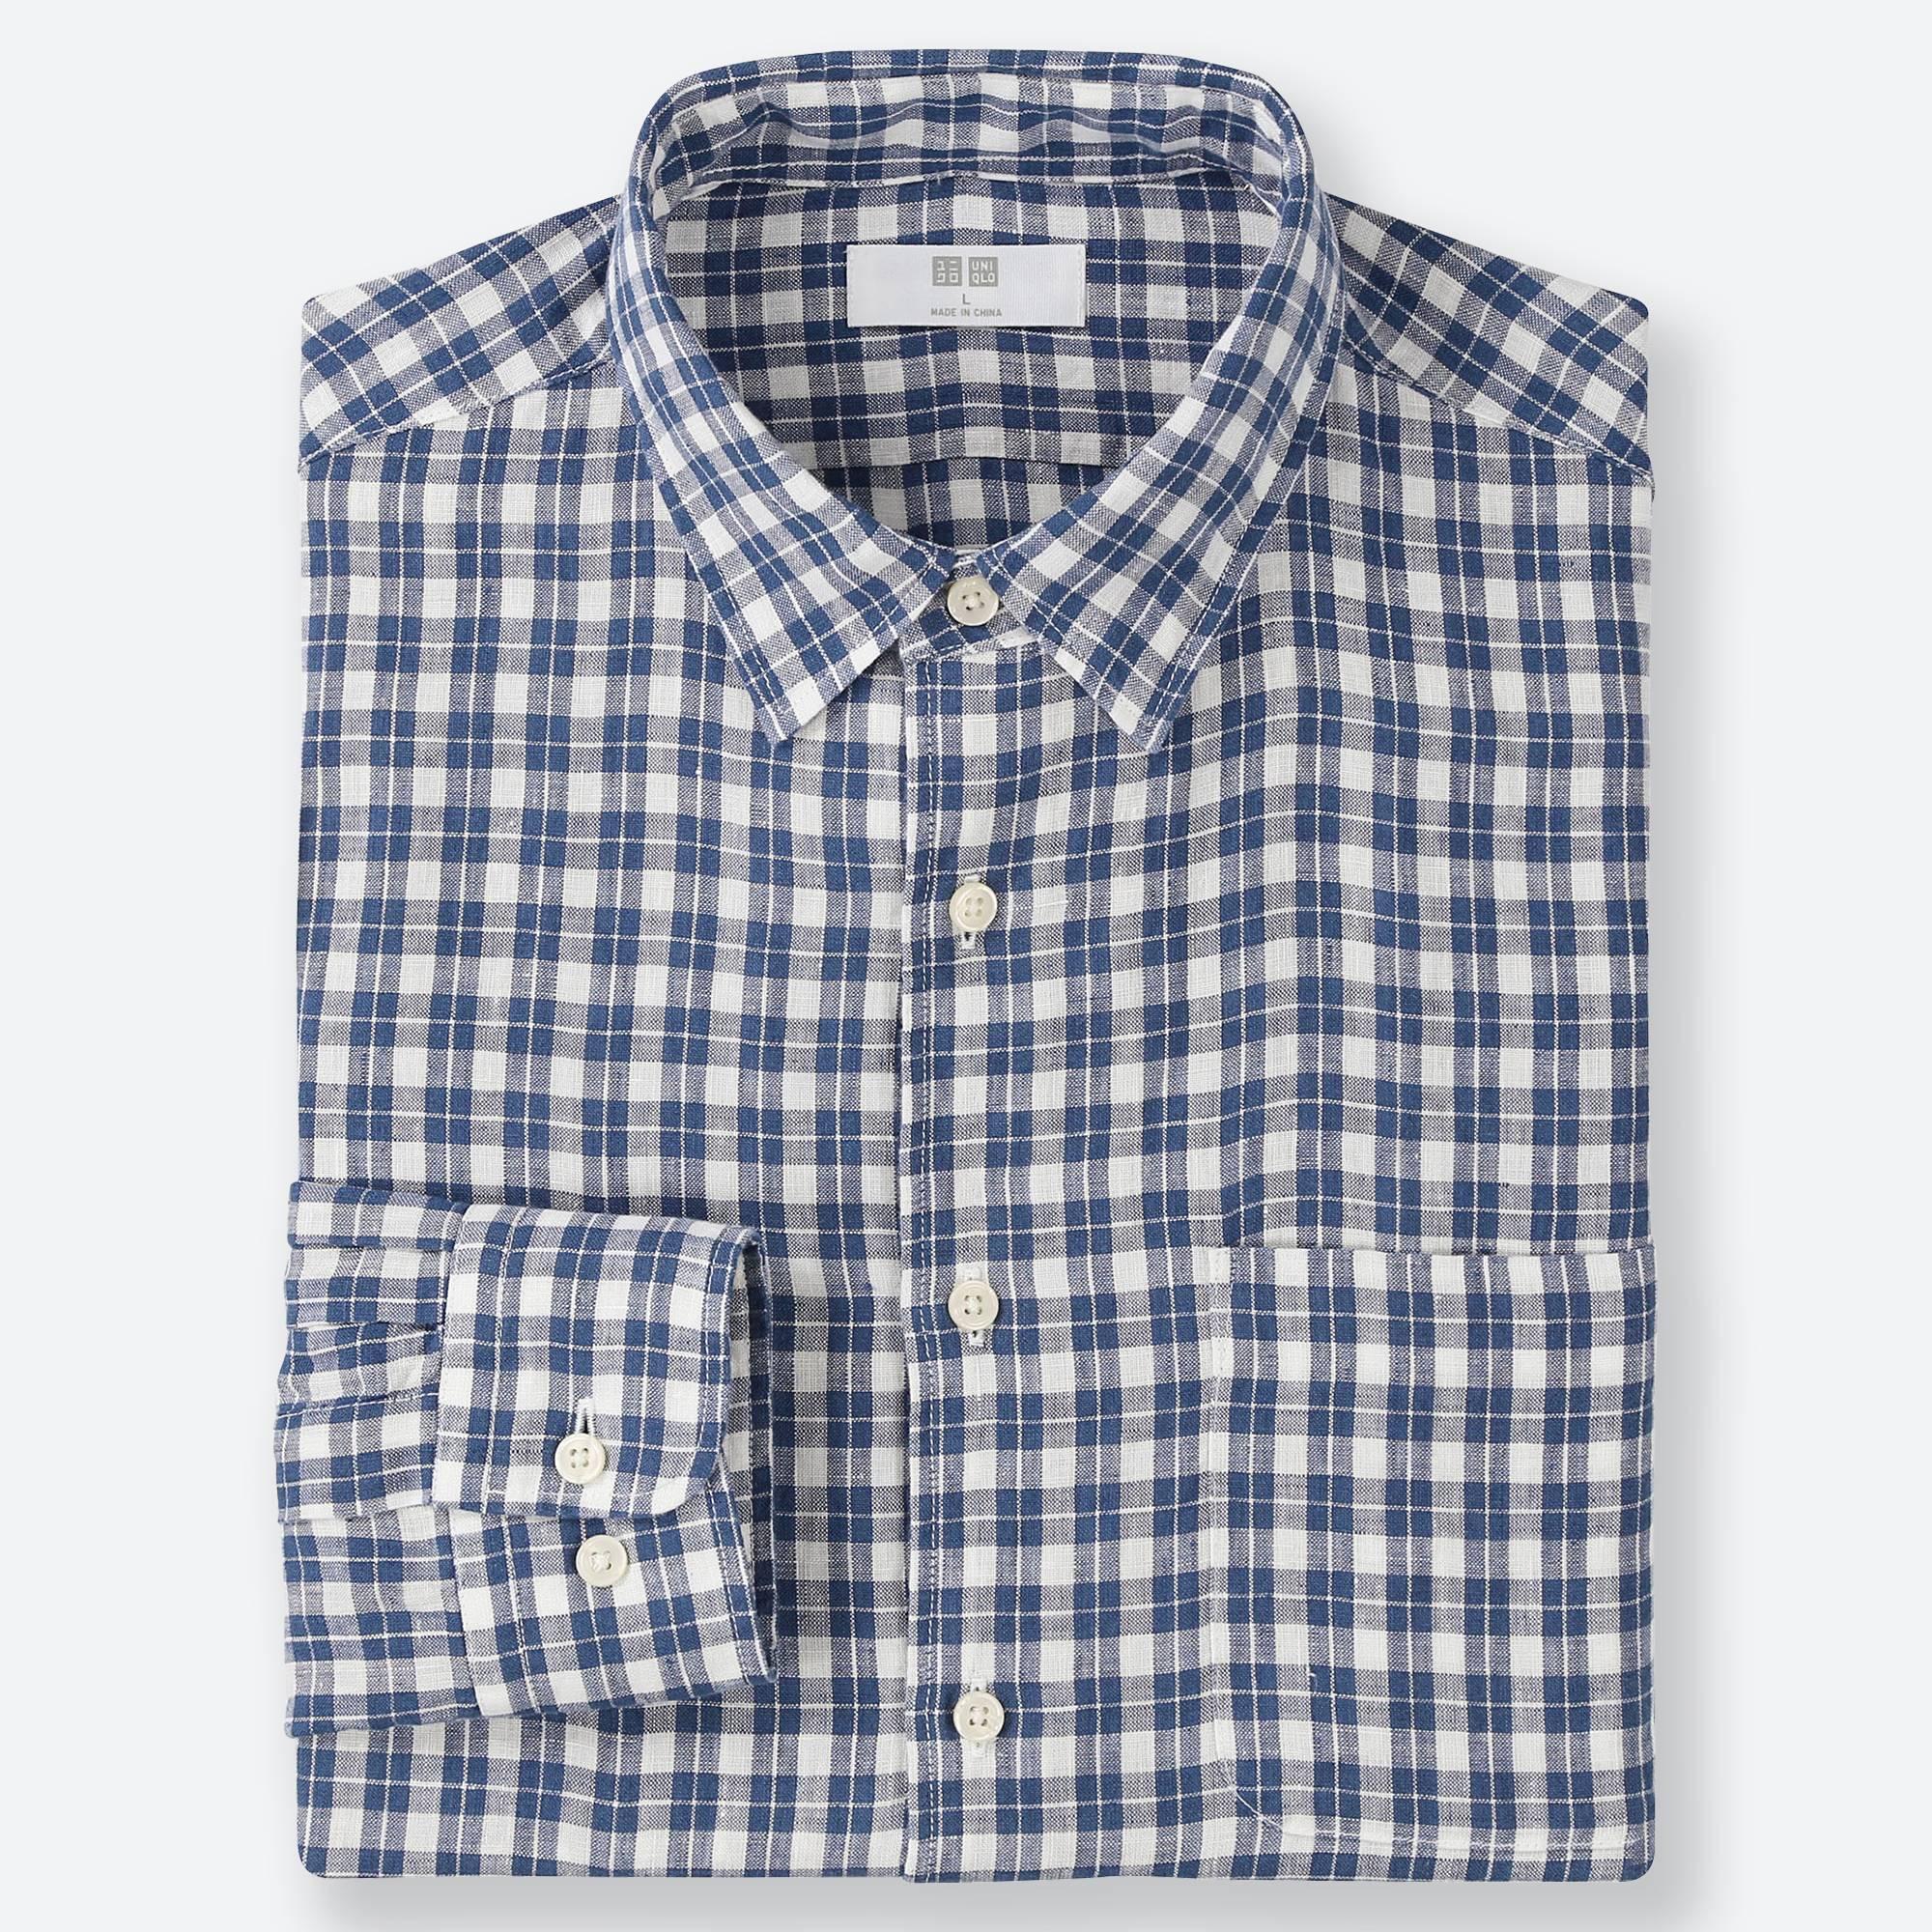 2c76e18c585 Lyst - Uniqlo Men Premium Linen Checked Long-sleeve Shirt in Blue ...